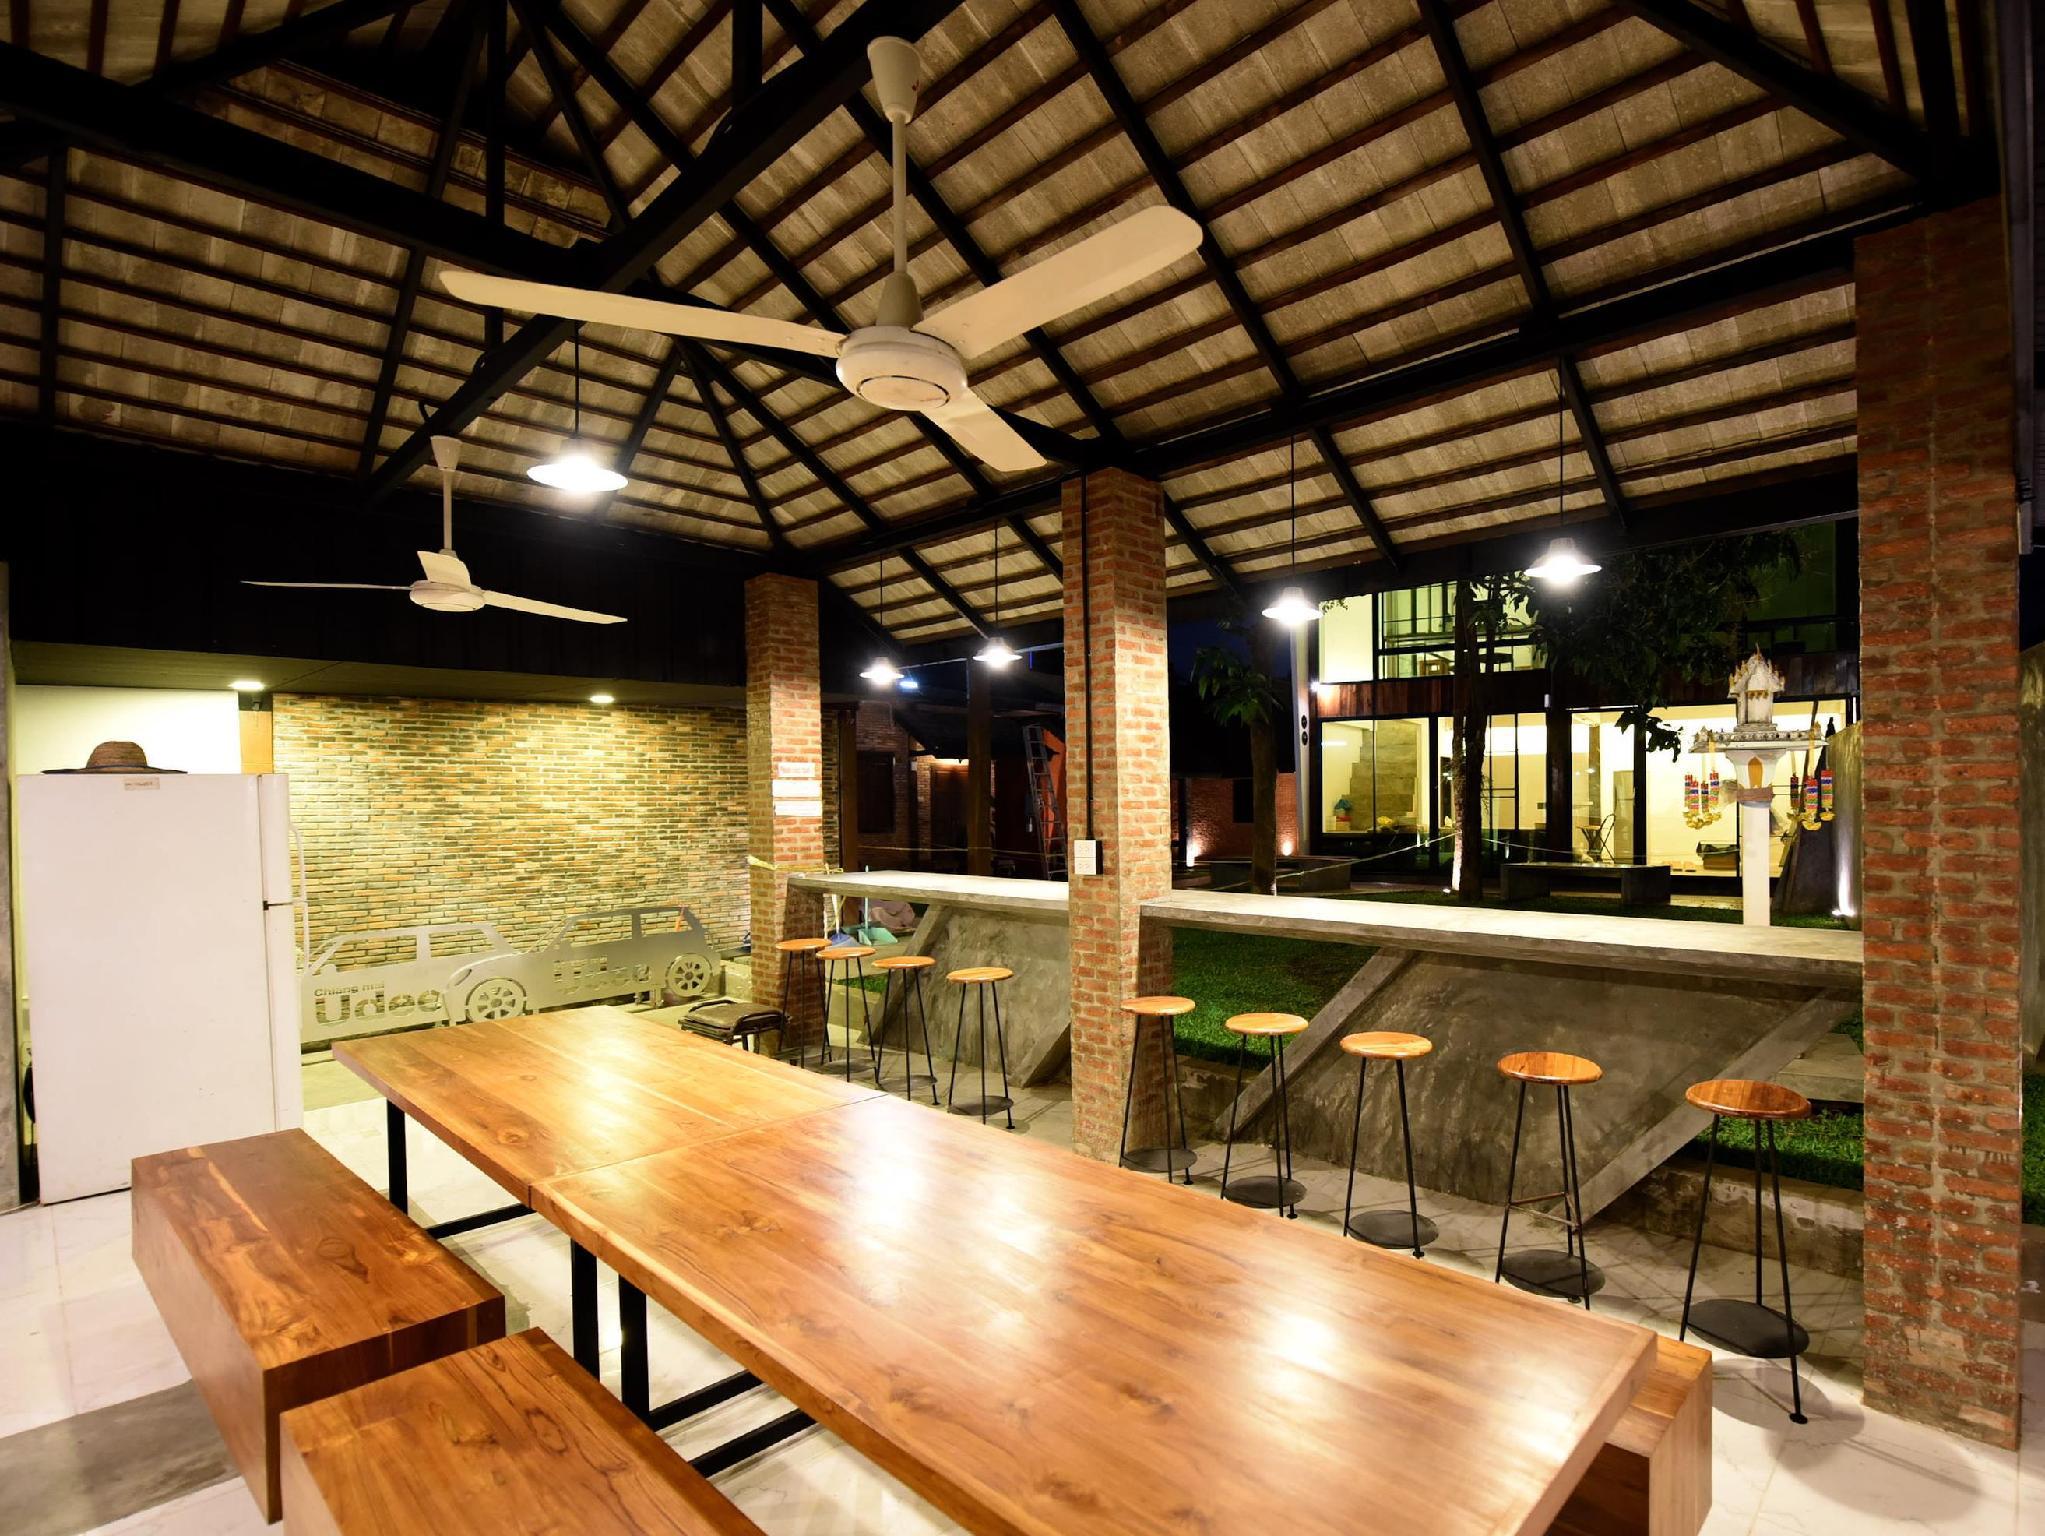 Chiang Mai Udee,เชียงใหม่อยูดี เบดแอนด์เบรคฟาสต์